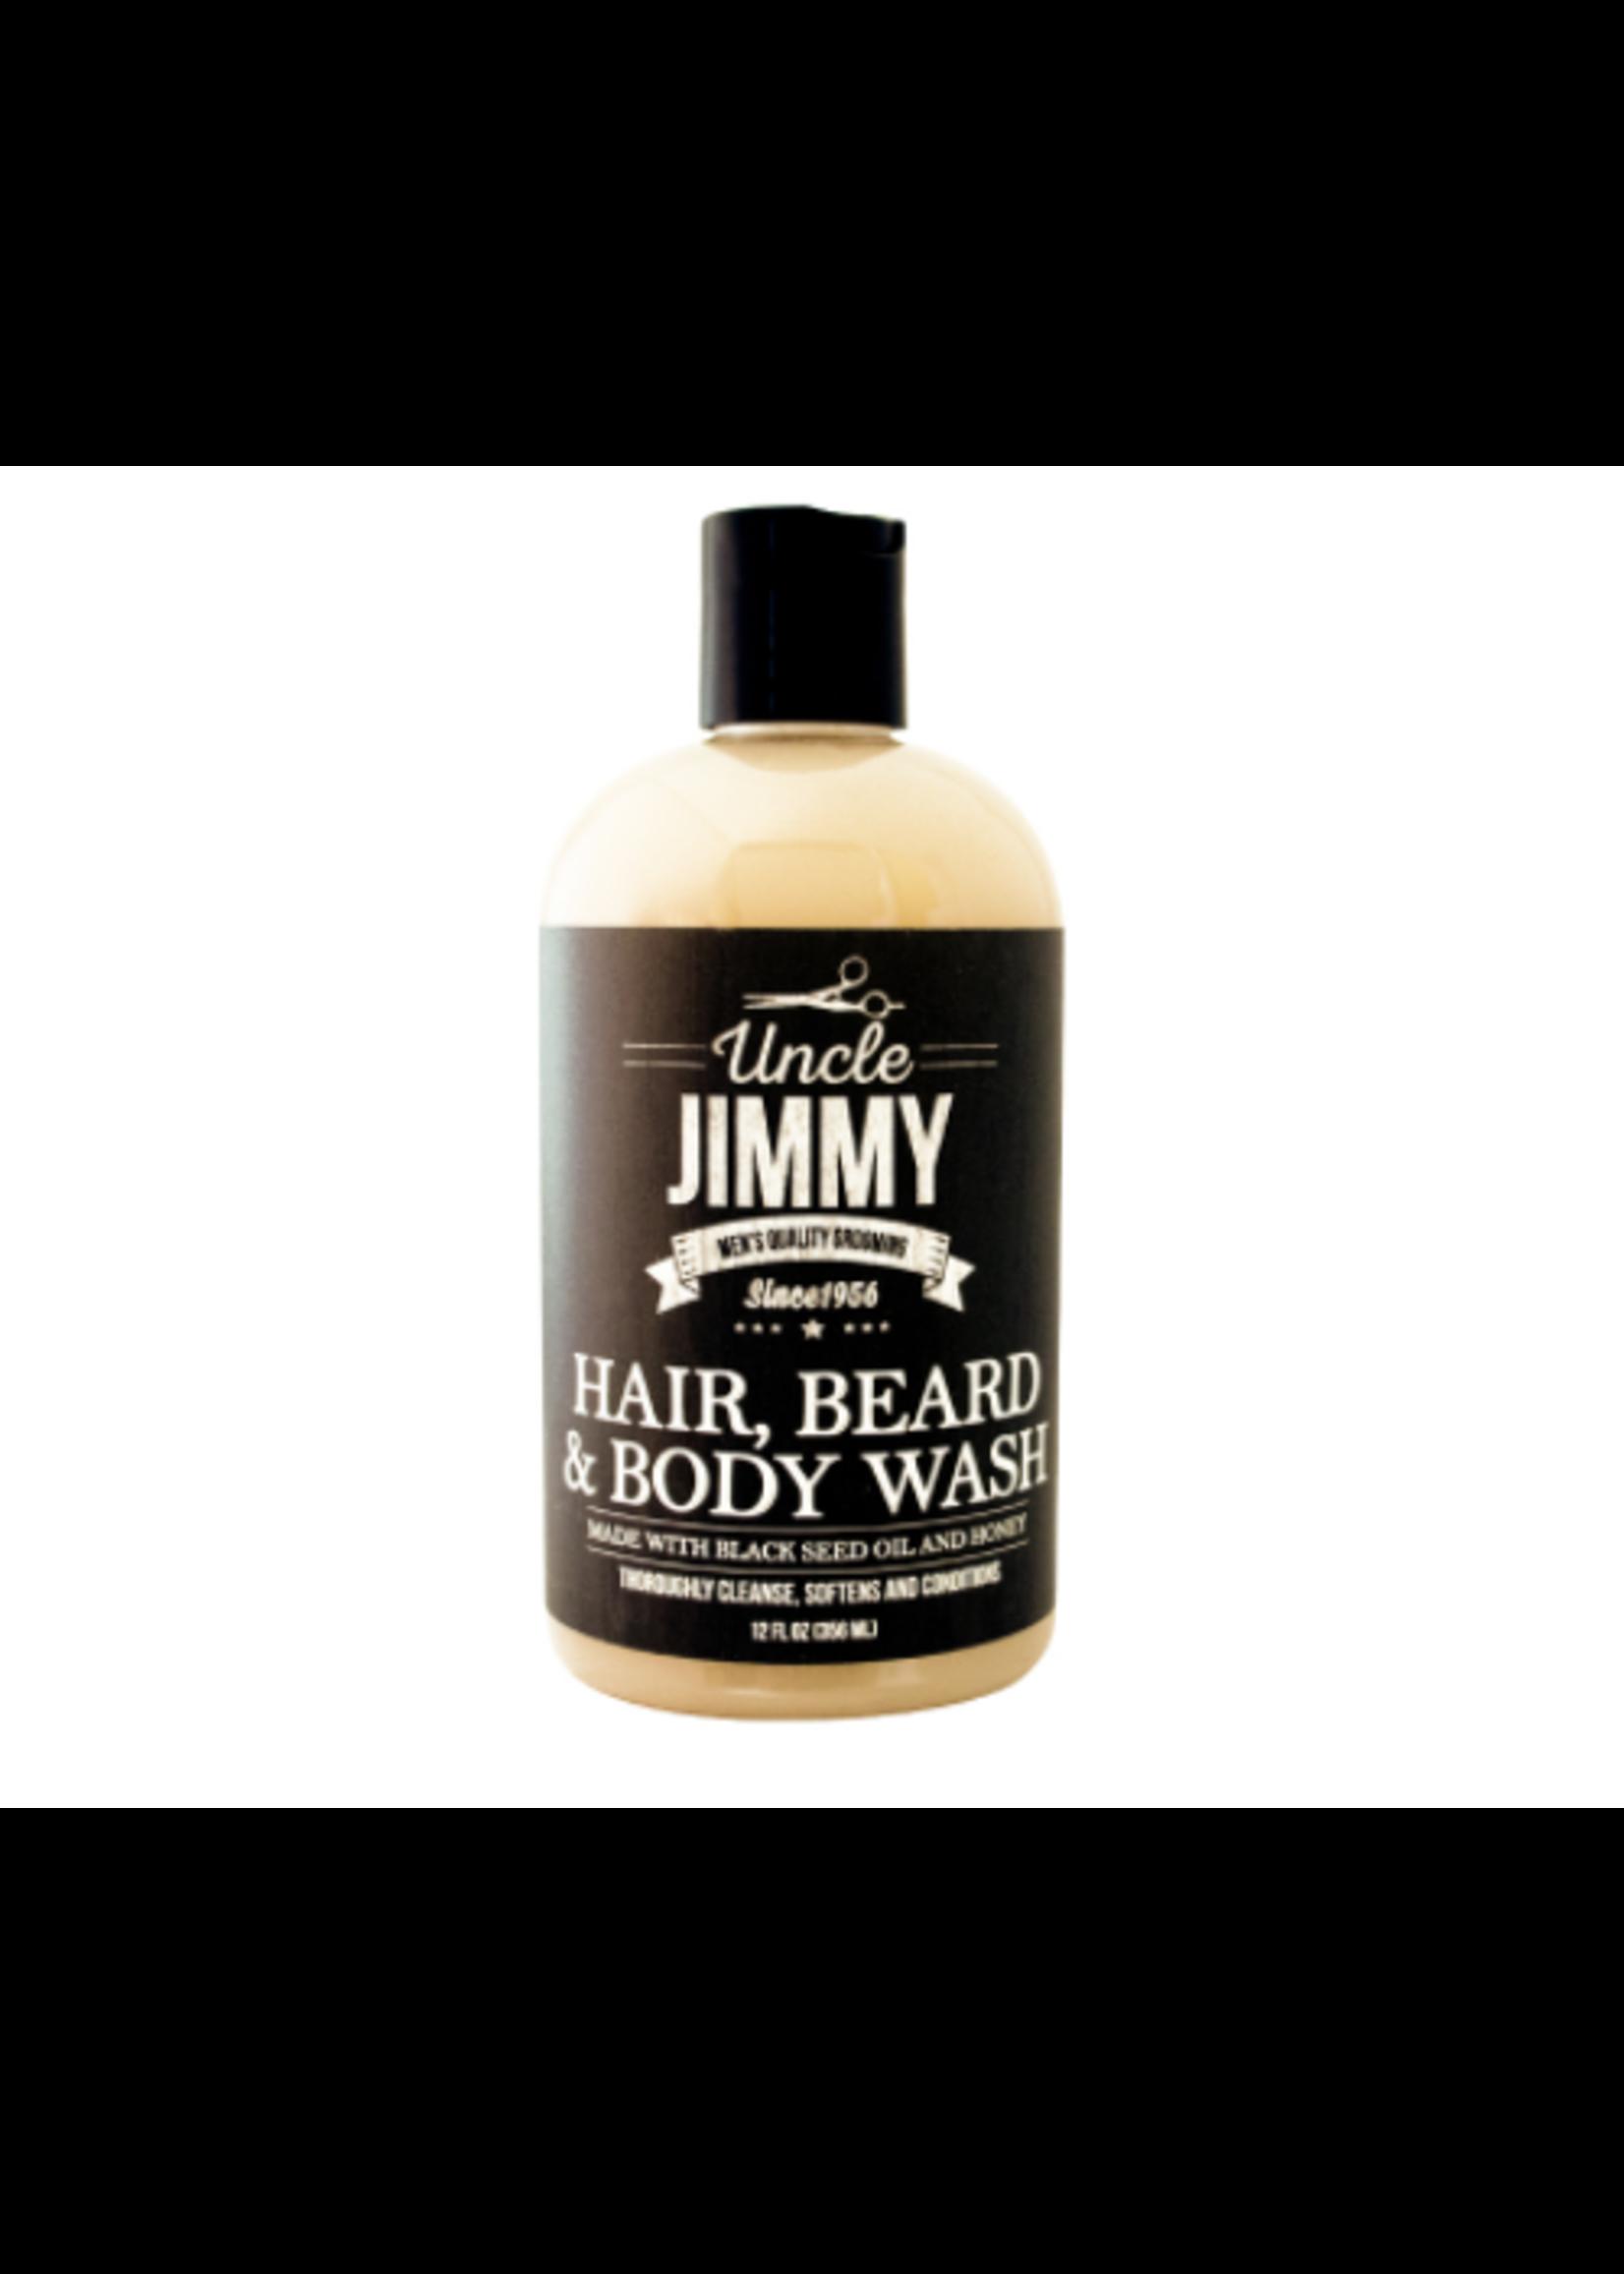 Uncle Jimmy Uncle Jimmy Hair, Beard, & Body Wash